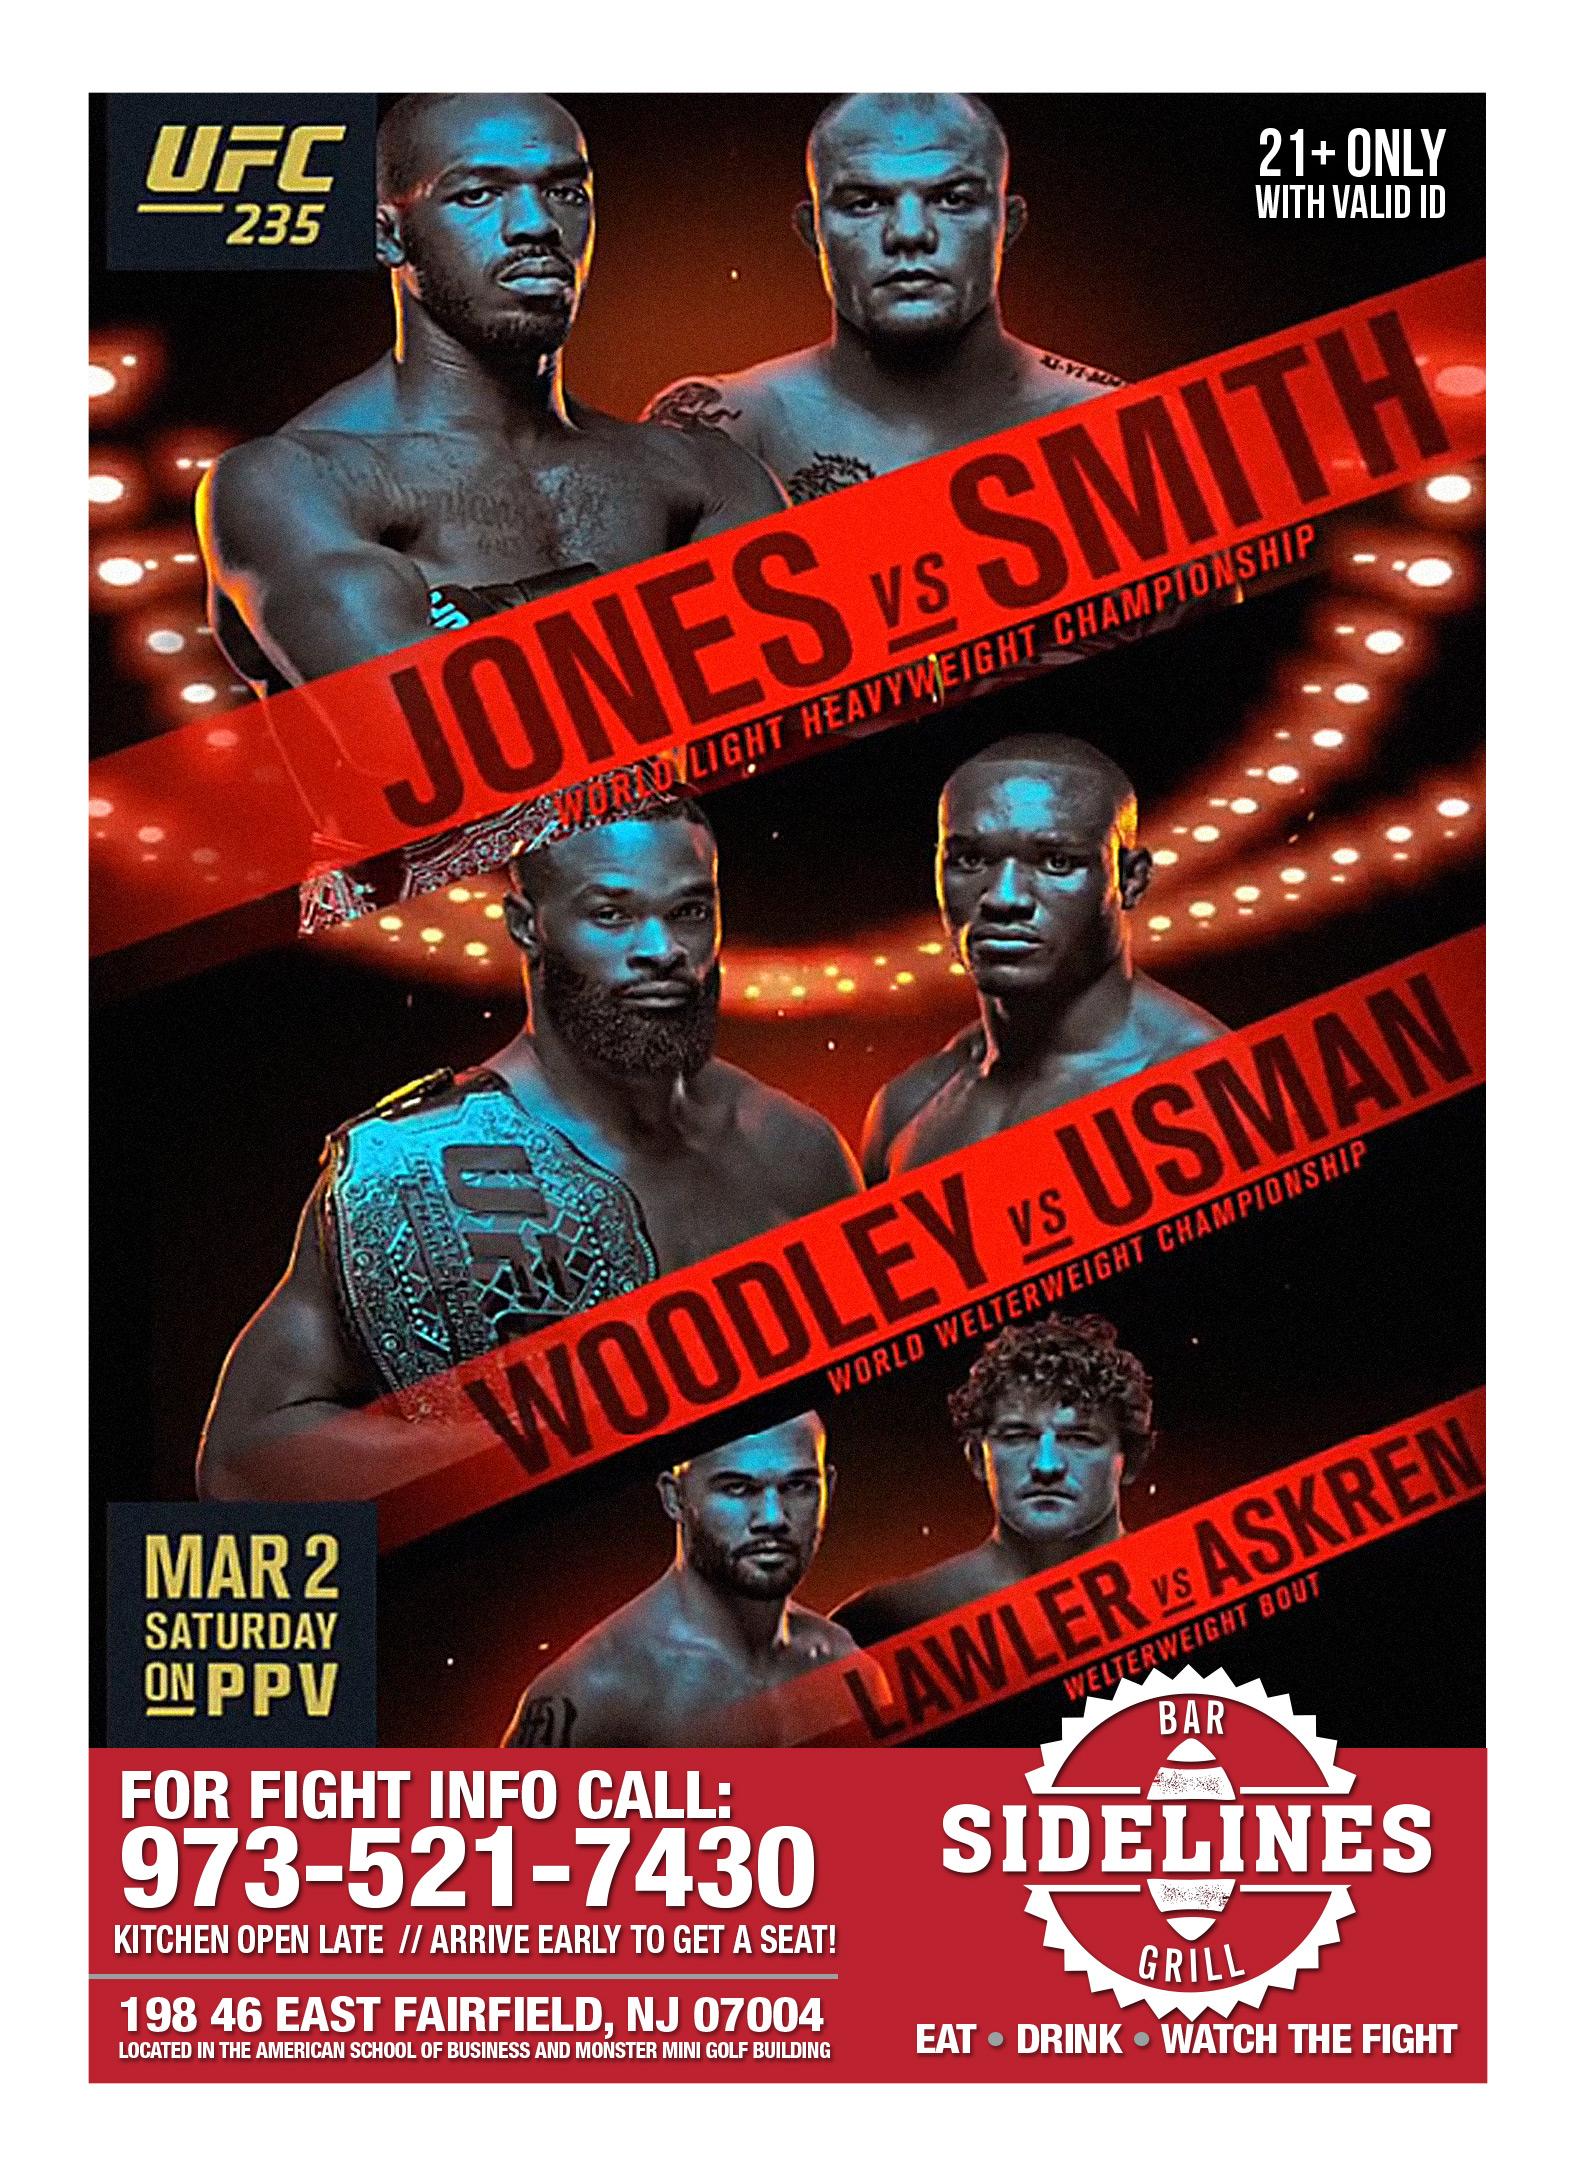 Sidelines_UFC235_5x7_AD.jpg